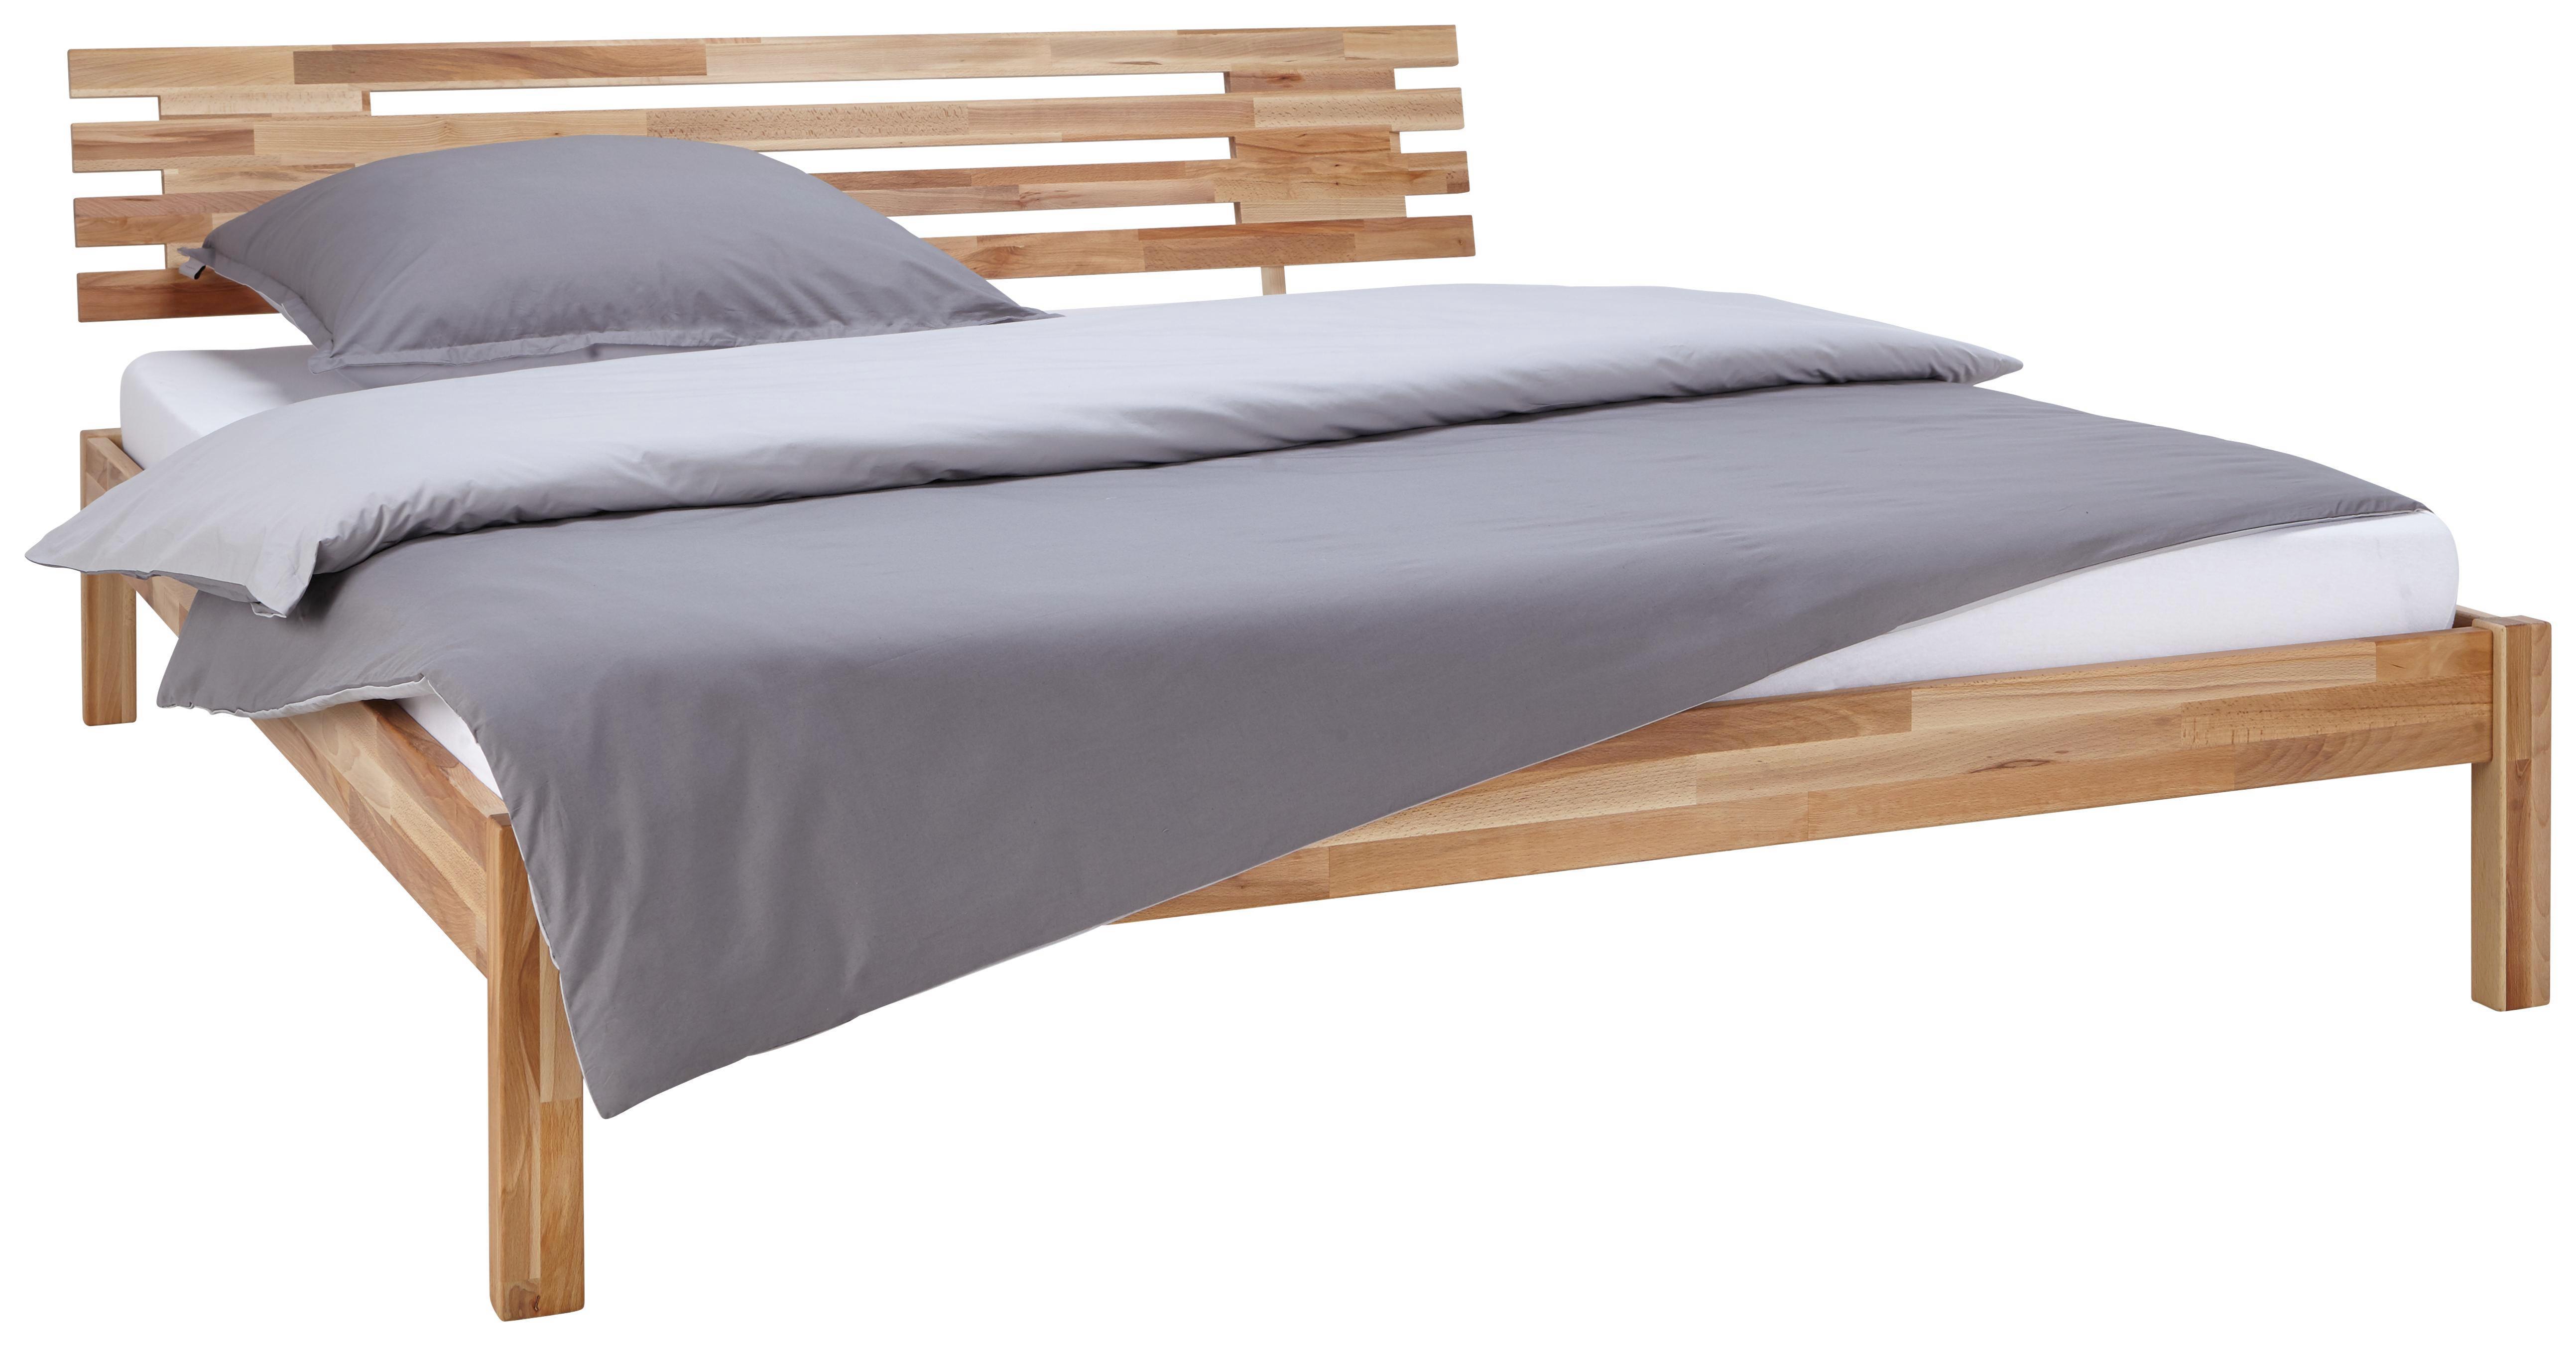 Bett 120x200 Holz Futonbett 120200 Frisch Bett 120200 Holz Neu 200